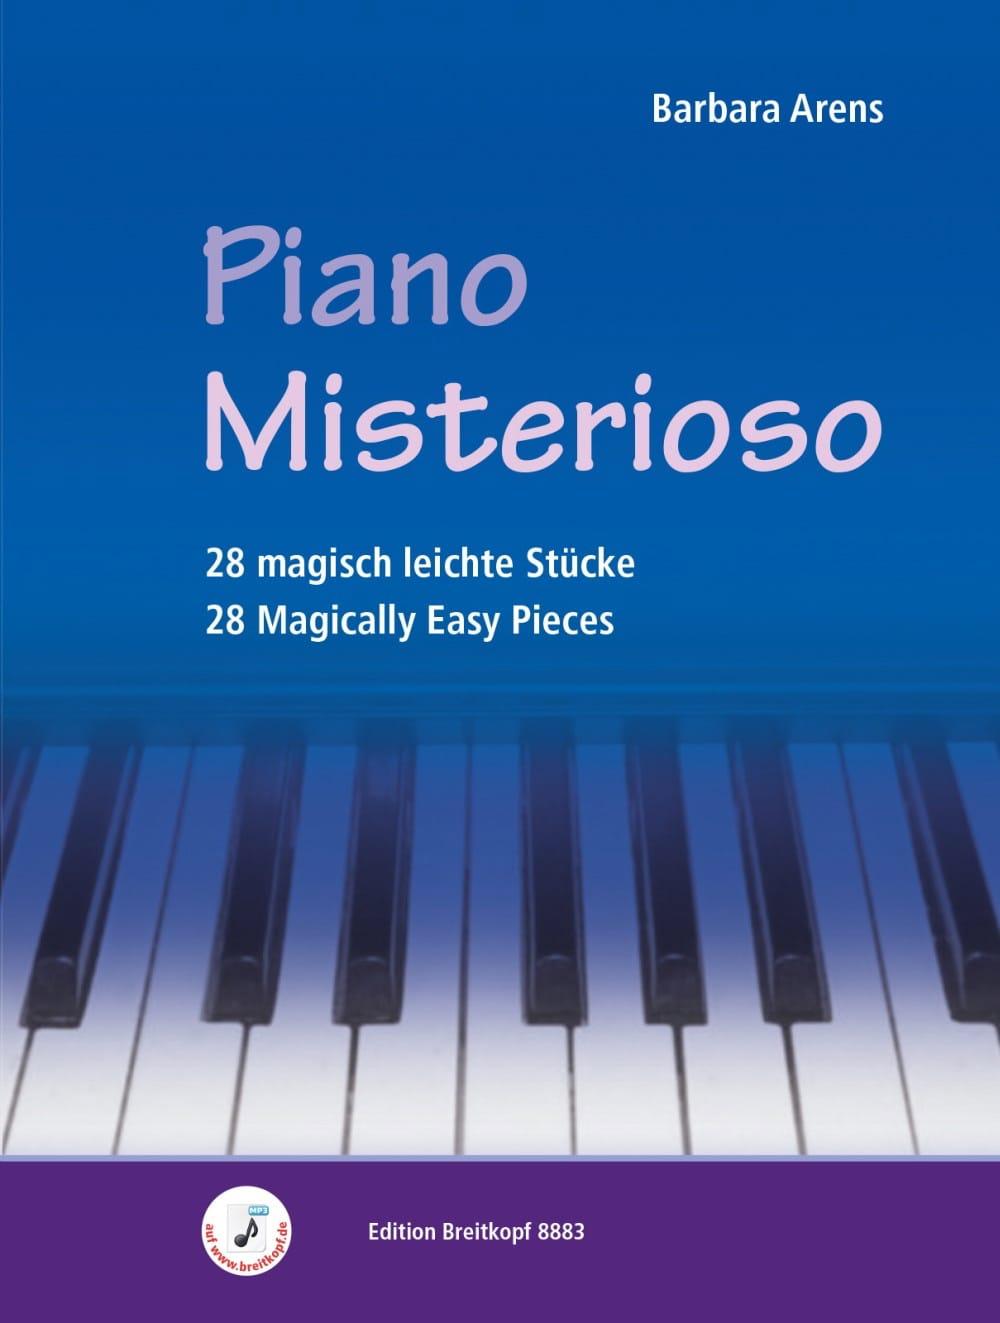 Piano Misterioso - Barbara Arens - Partition - laflutedepan.com